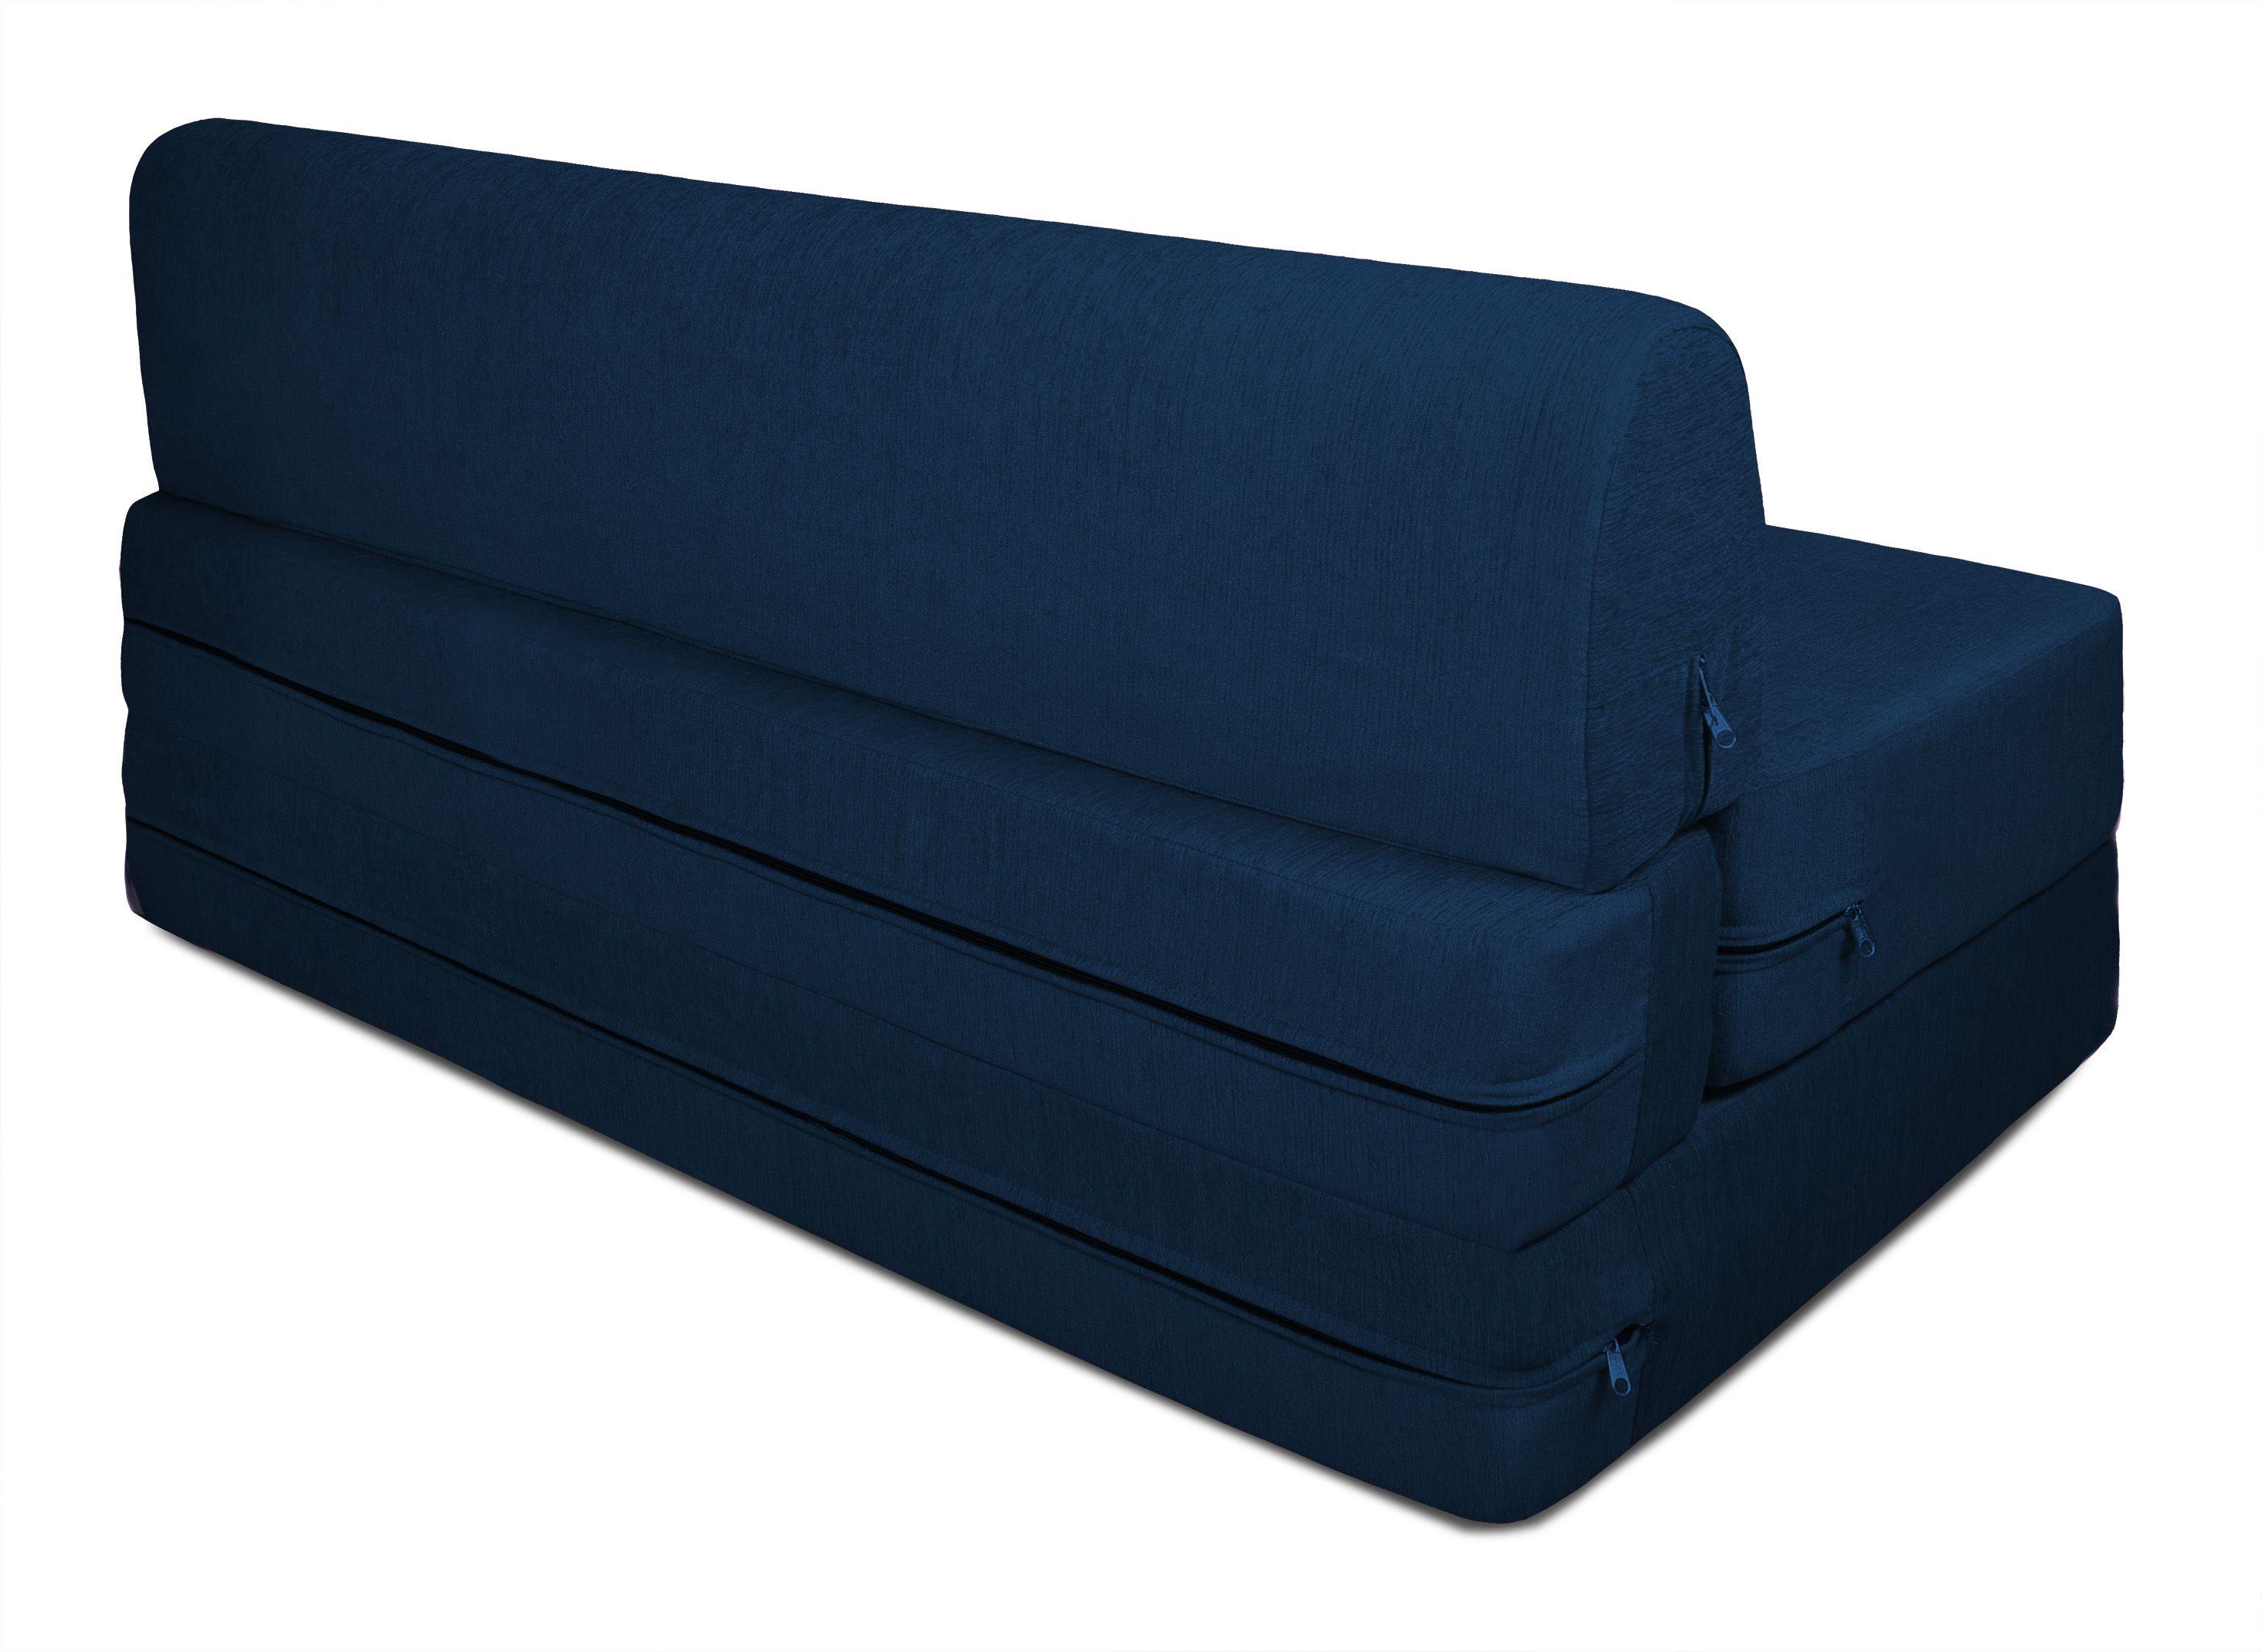 Dolphin Zeal Sofa Cum Bed 4ft x 6ft Buy Dolphin Zeal Sofa Cum